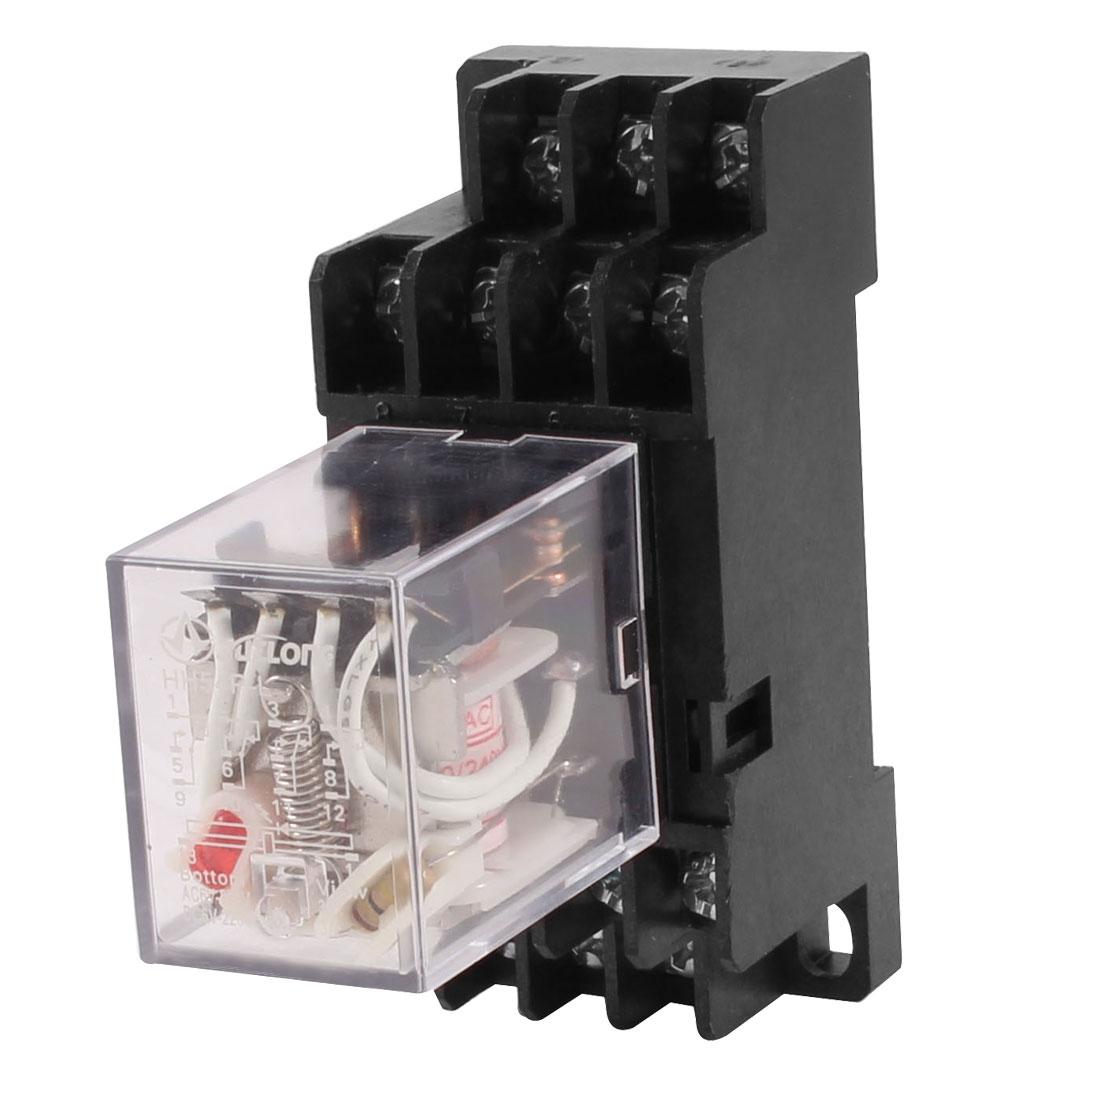 5A 250V AC DIN Rail Mount 14 Screws 4PDT General Power Relay w Socket